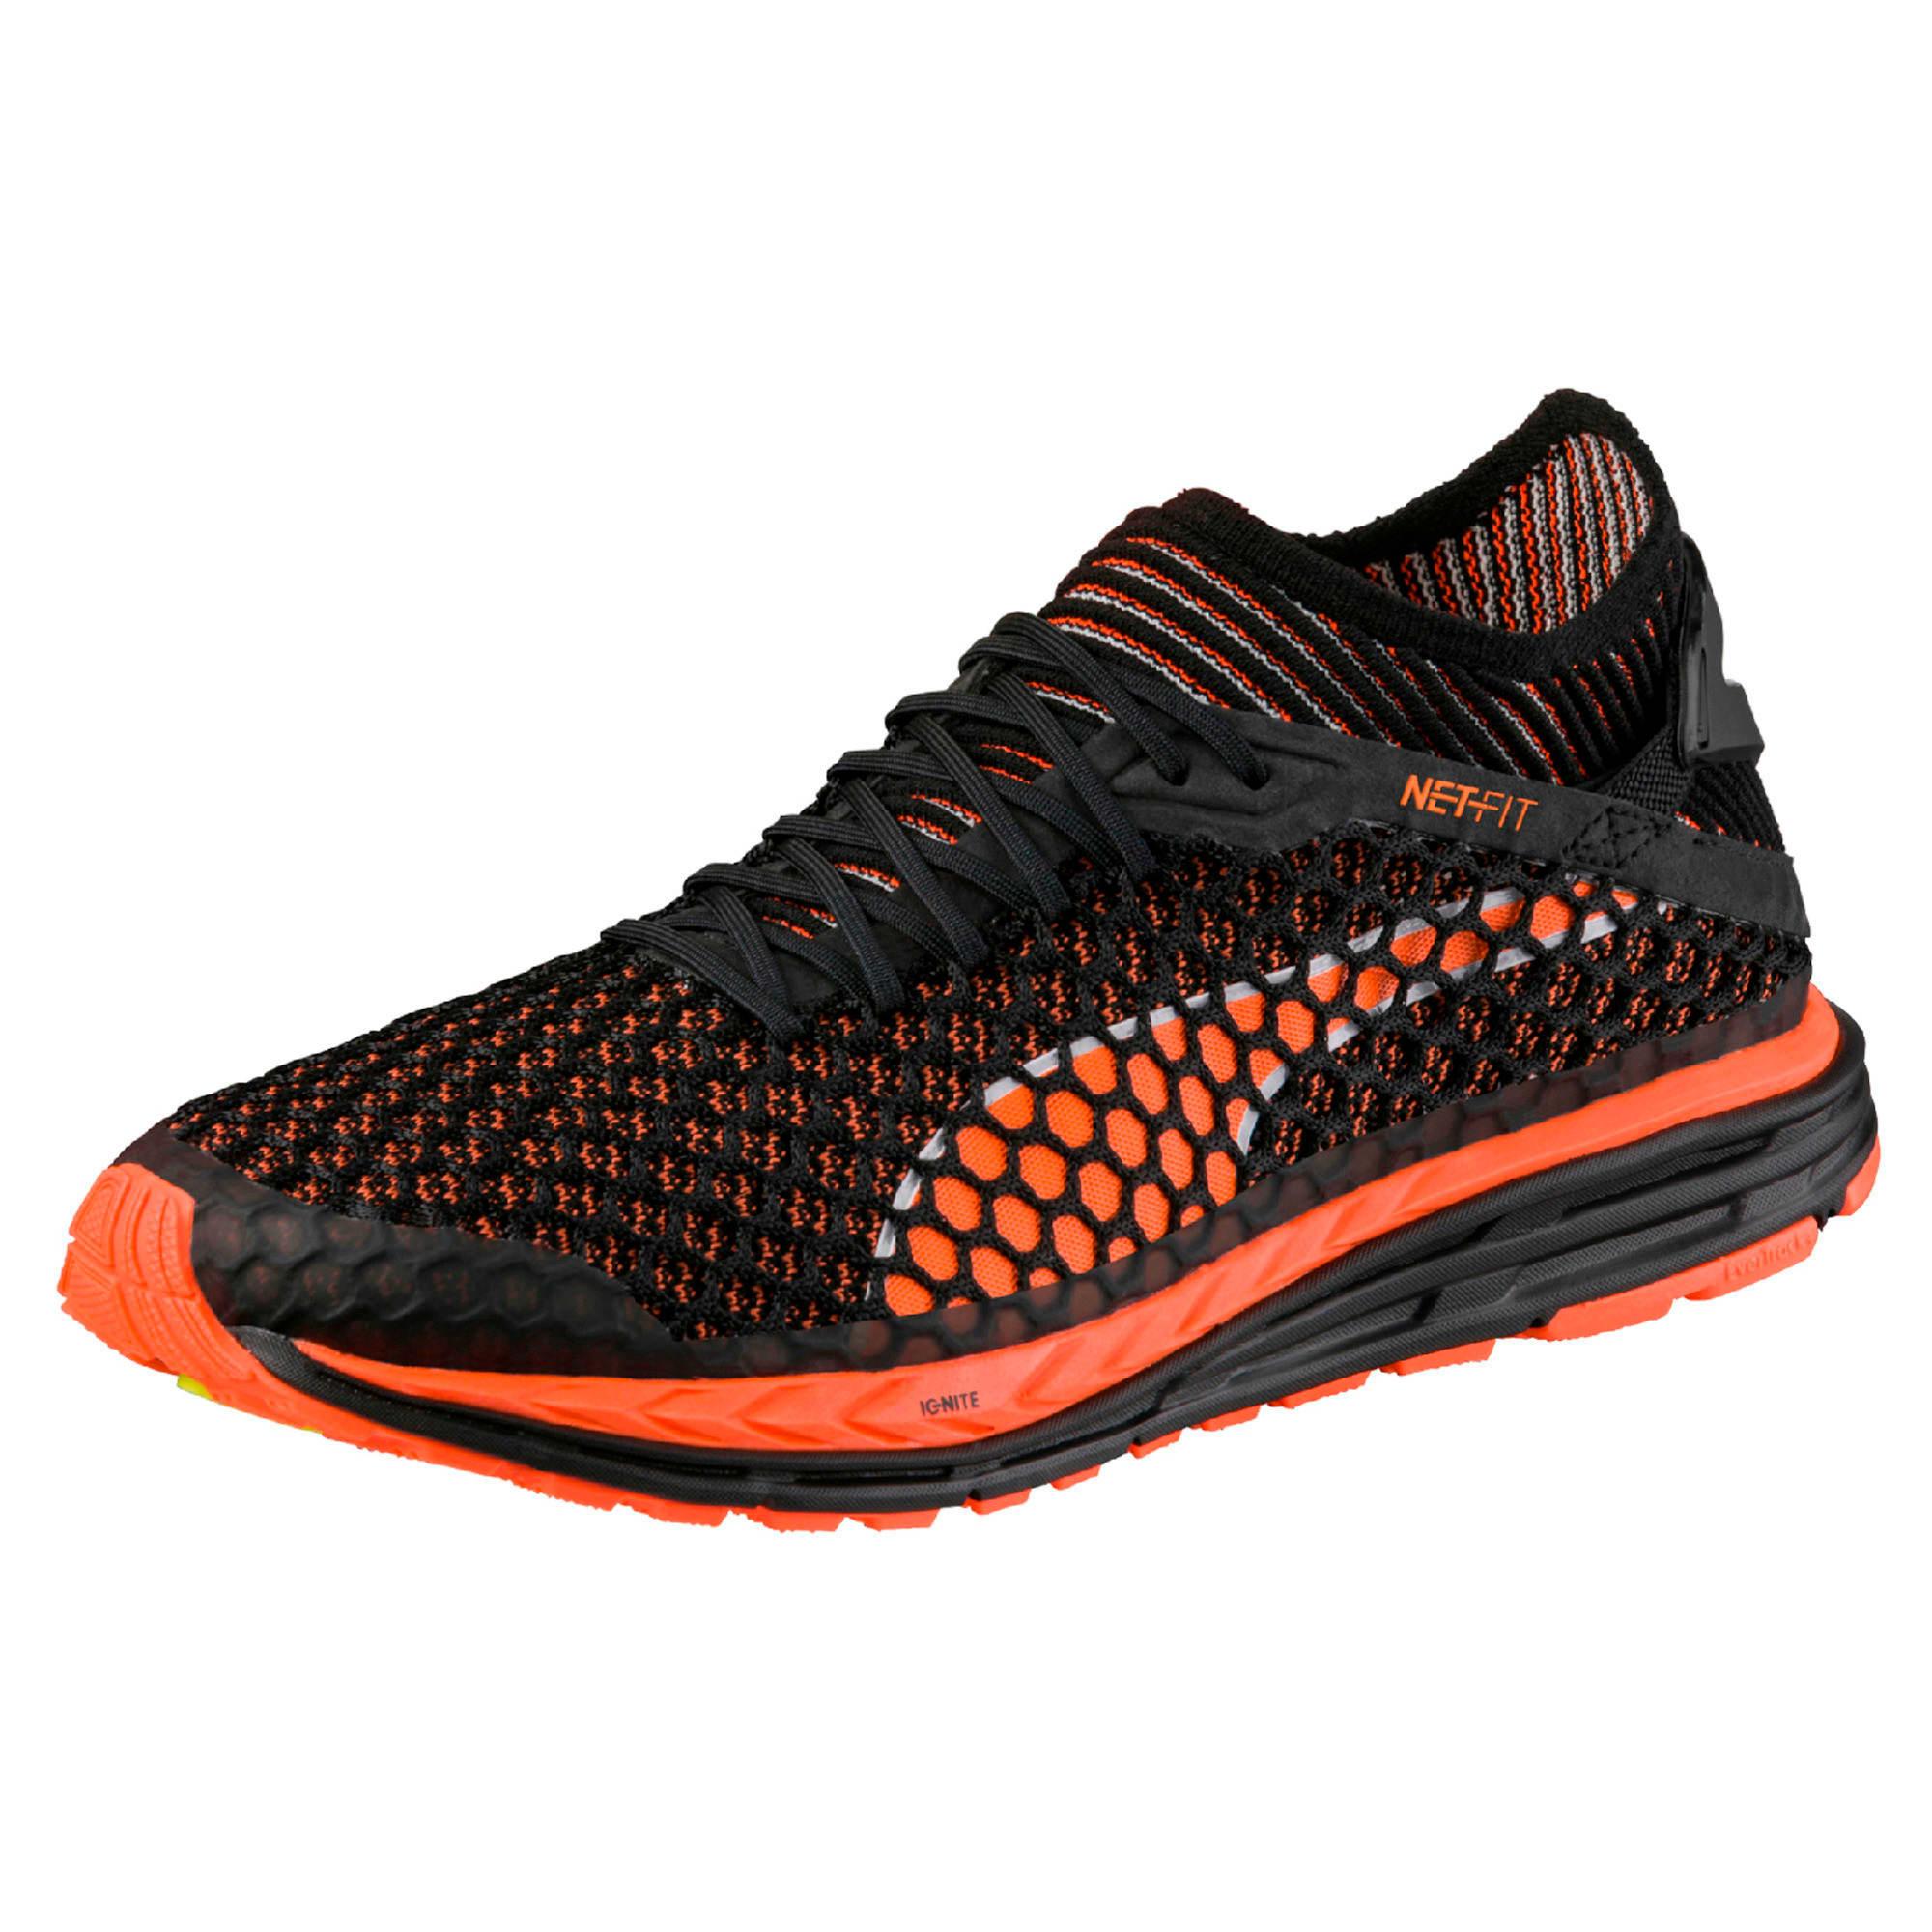 Thumbnail 1 of Speed IGNITE NETFIT Men's Running Shoes, Black-Shocking Orange-White, medium-IND